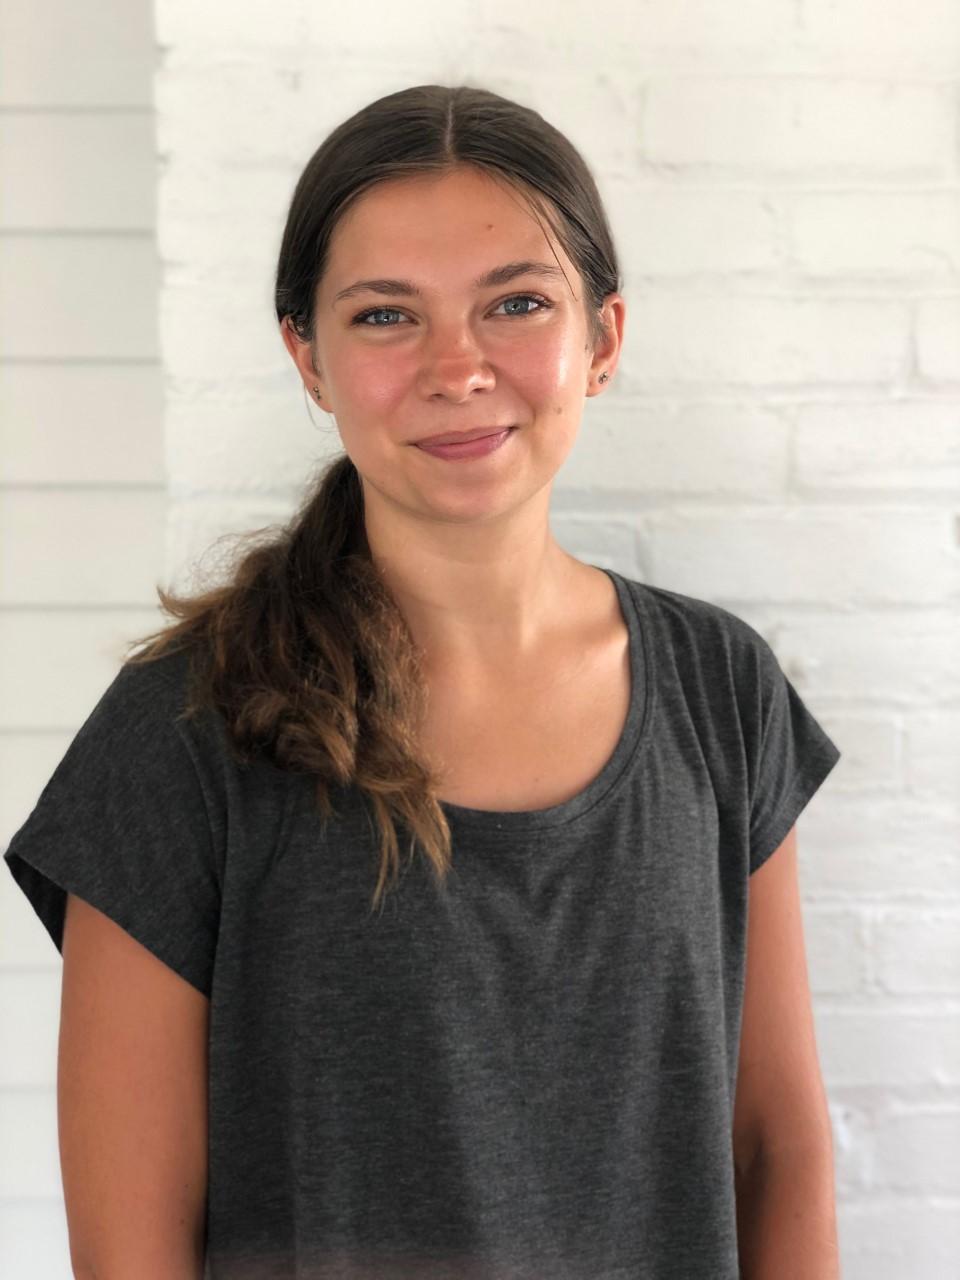 Rachel Jablonski